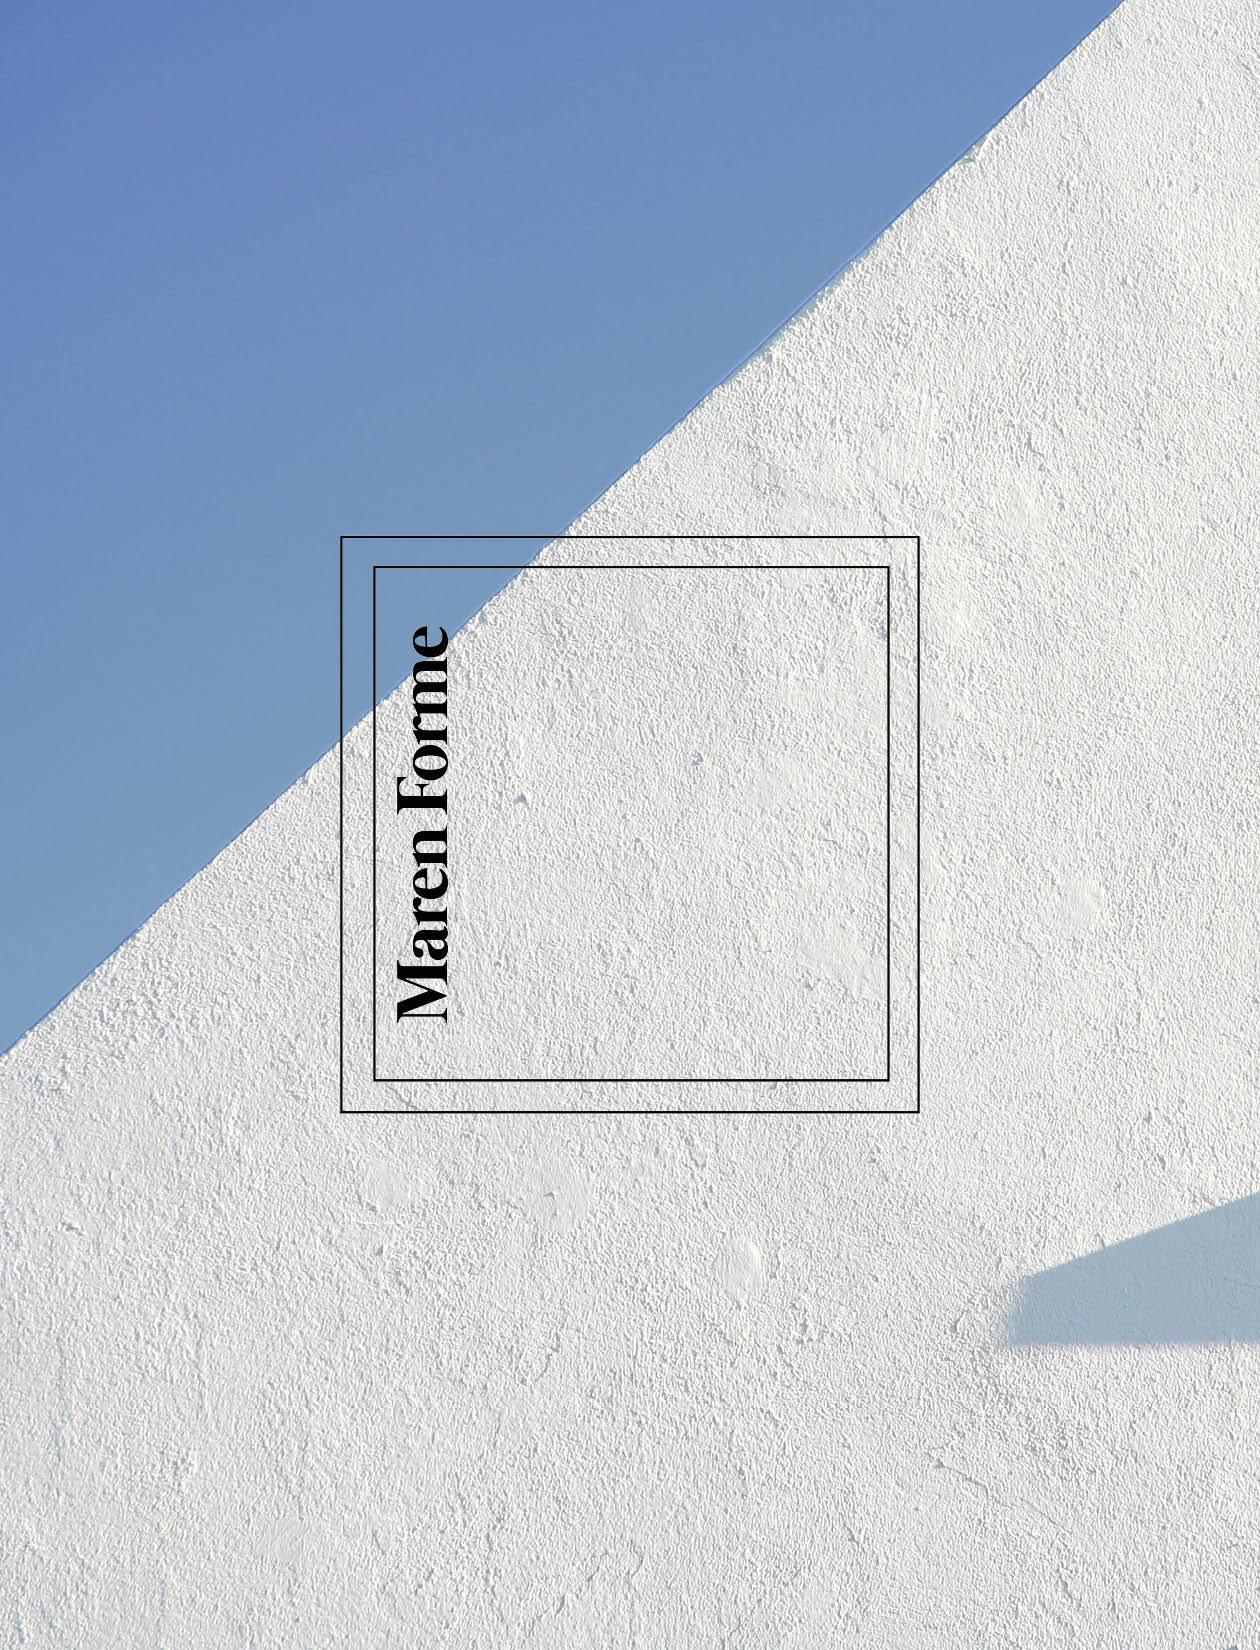 NoteCard Design.jpg